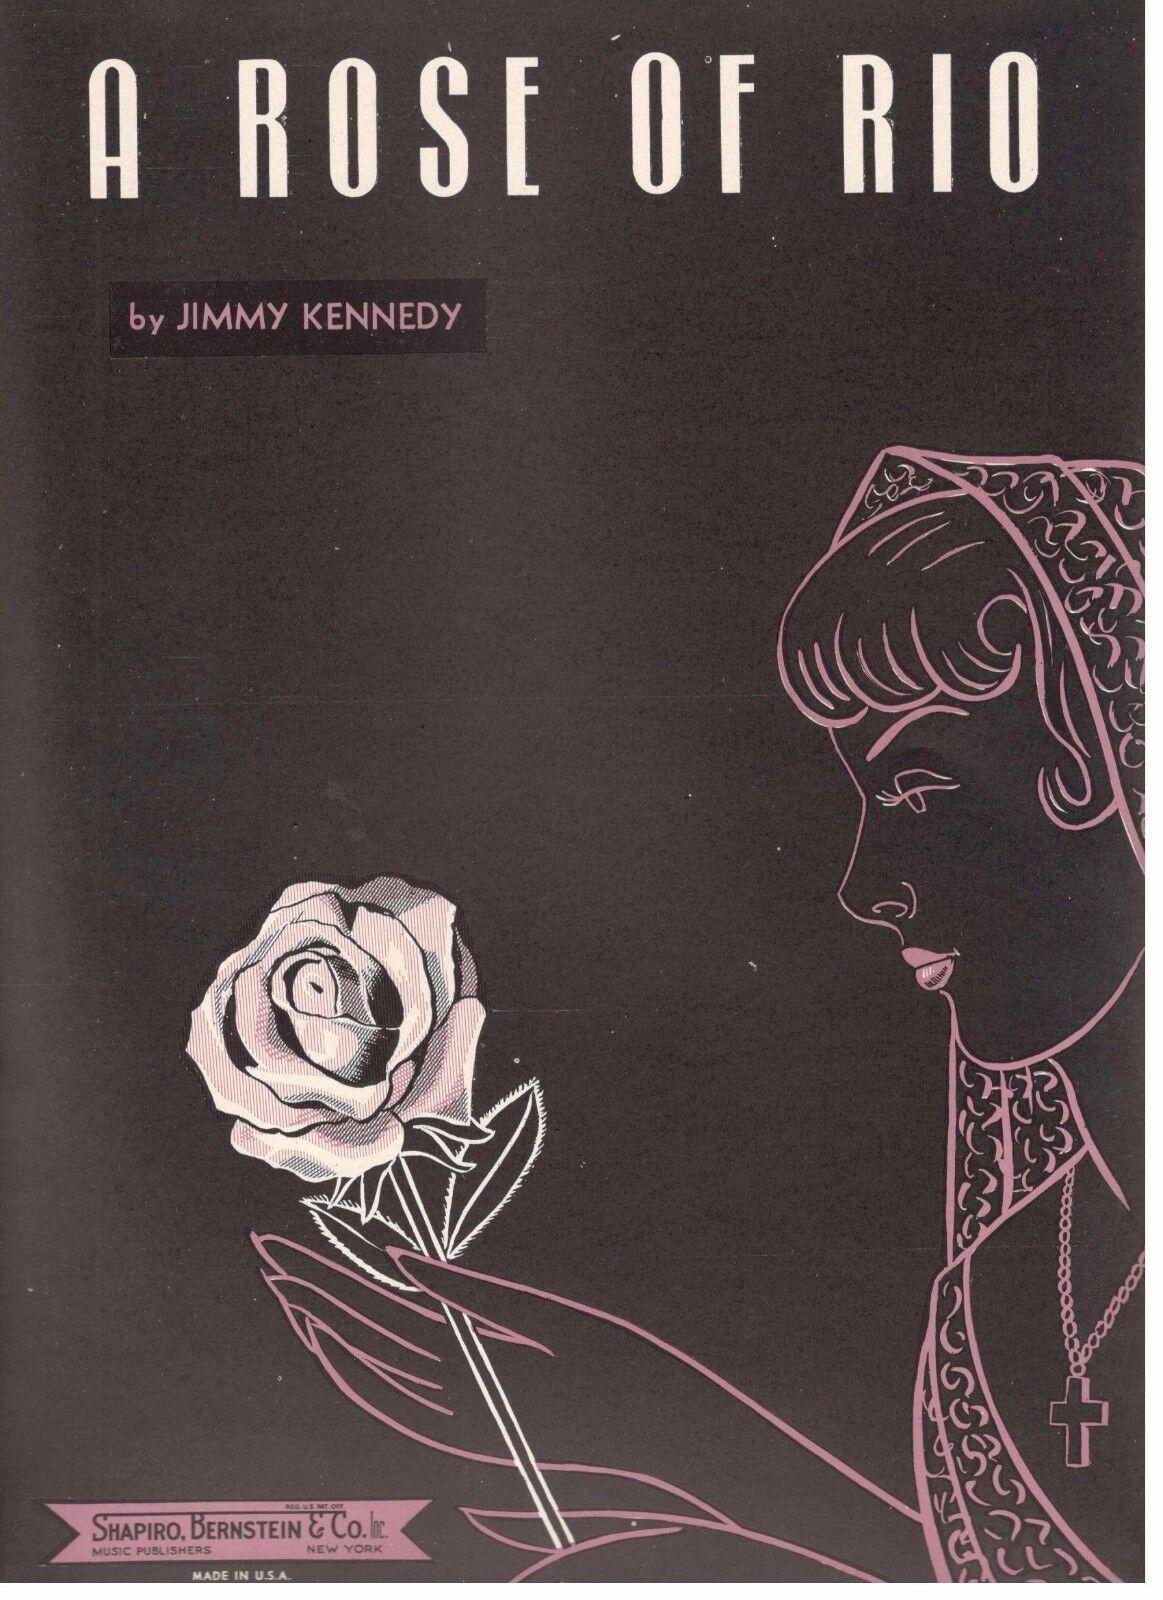 JIMMY KENNEDY